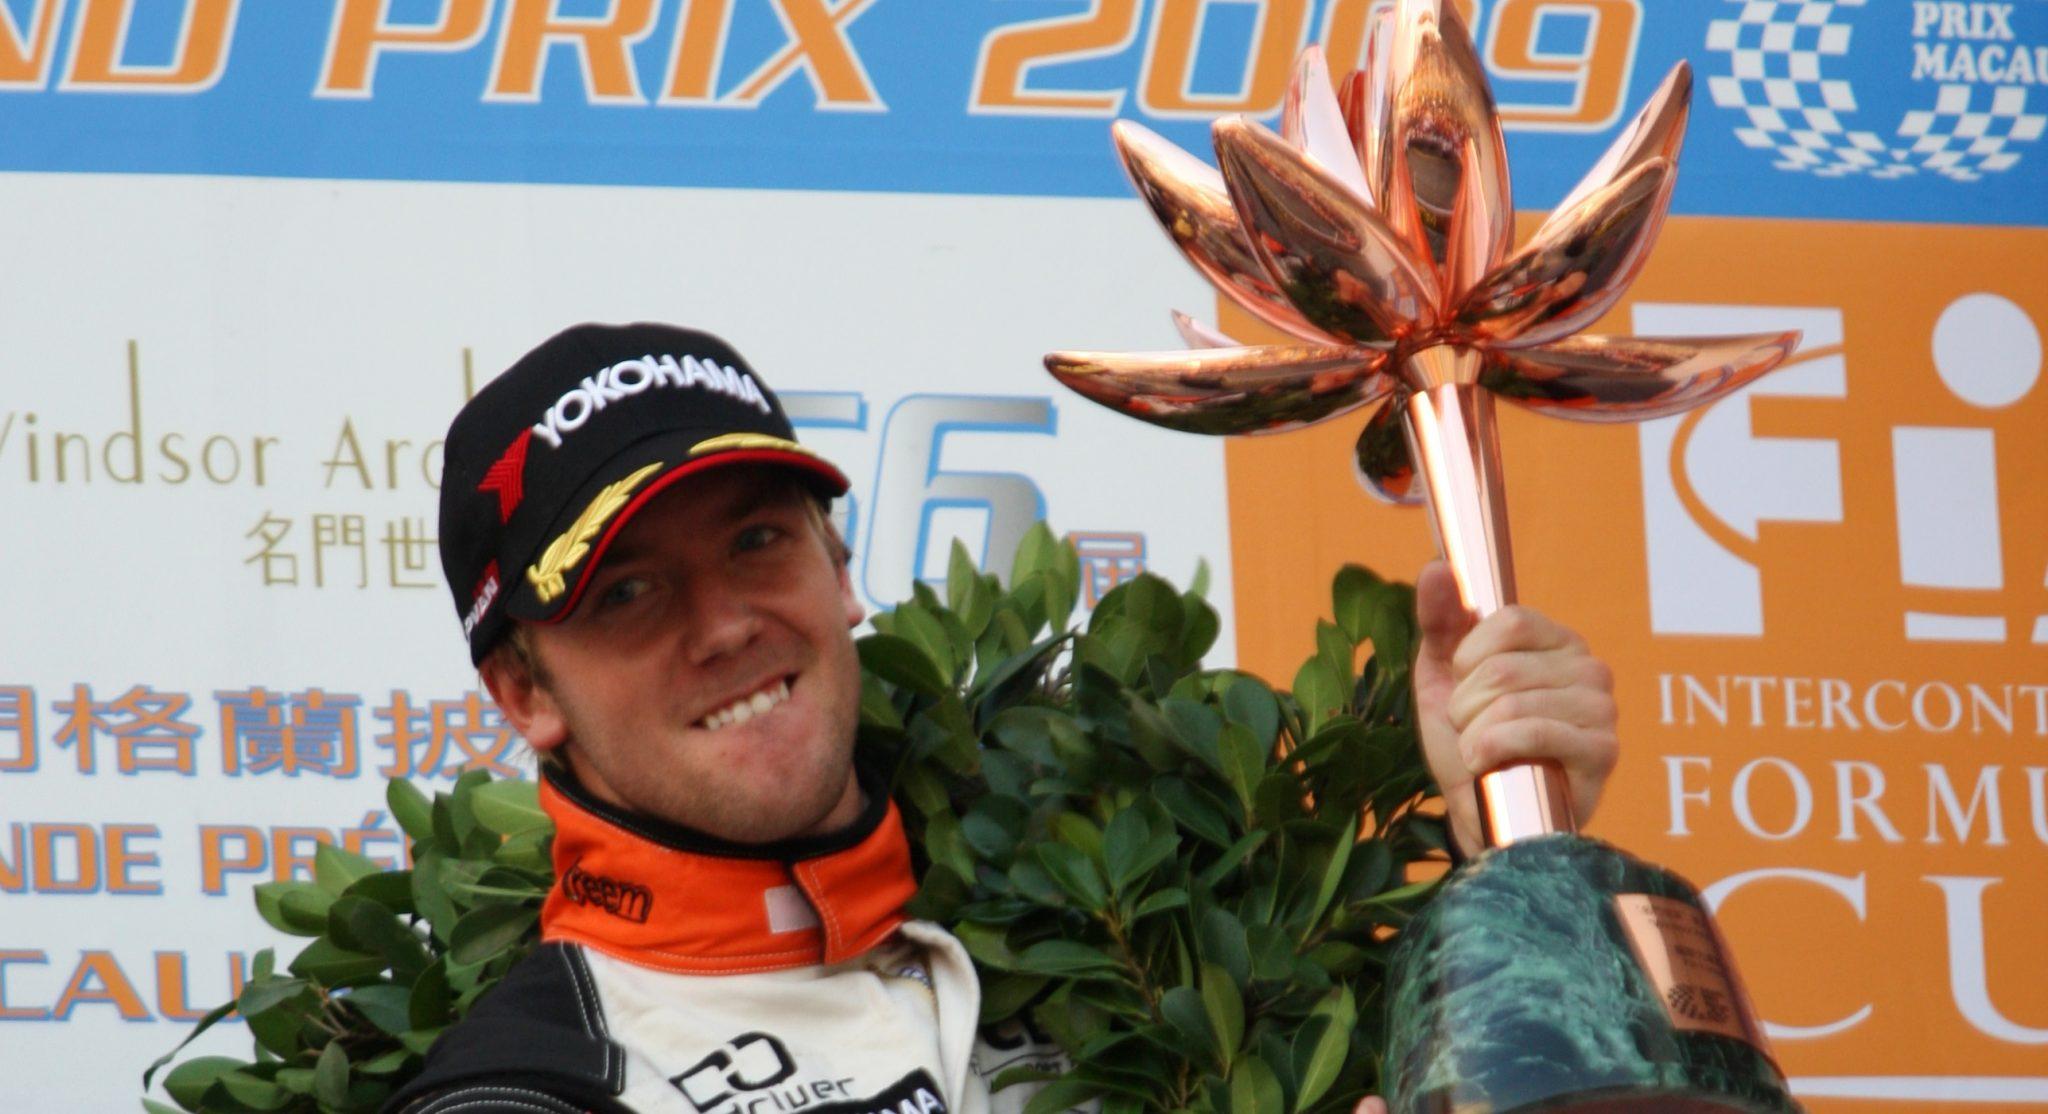 Club Lunch: Formula E: Racing To The Future ? A Conversation with Sam Bird, Formula E Race Winner